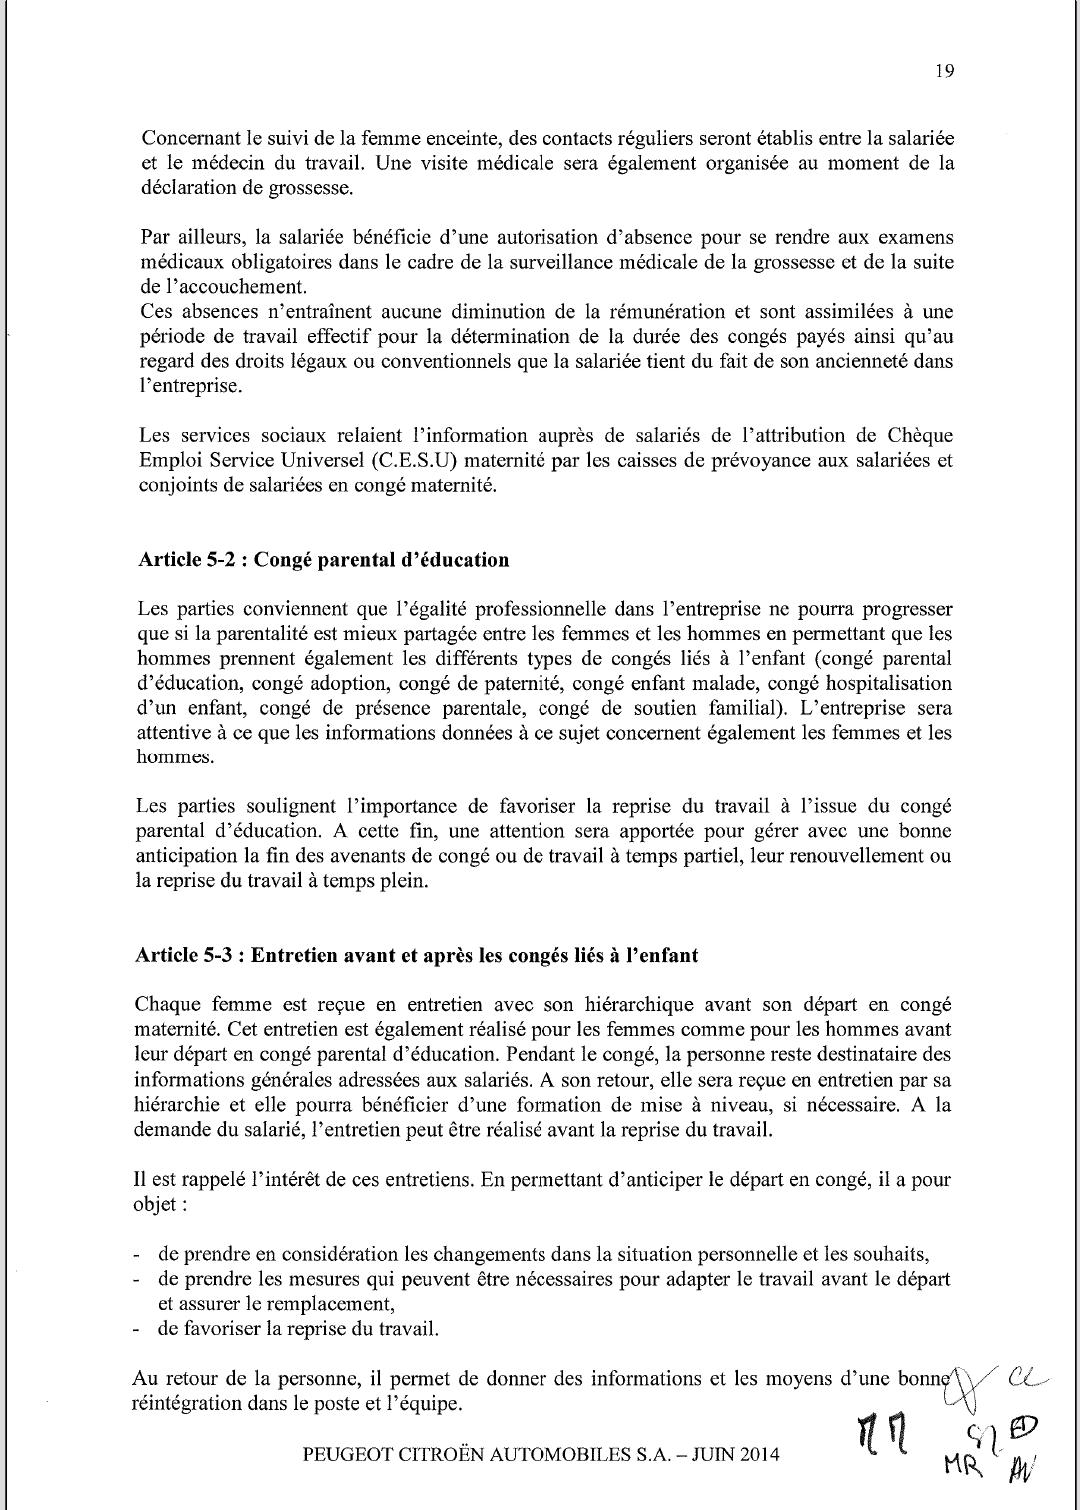 Accord19